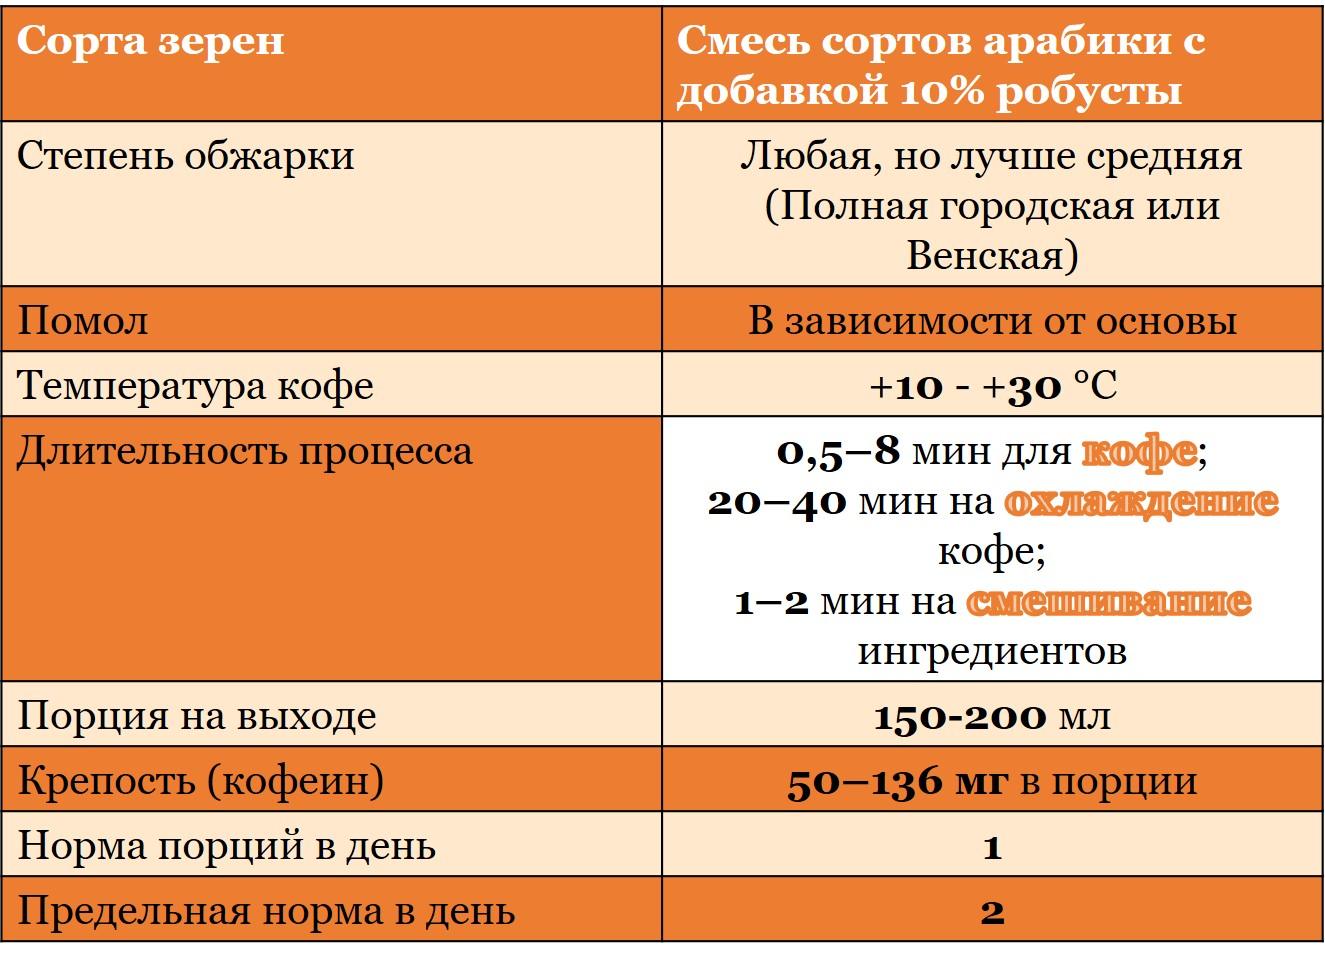 таблица характеристик глясе